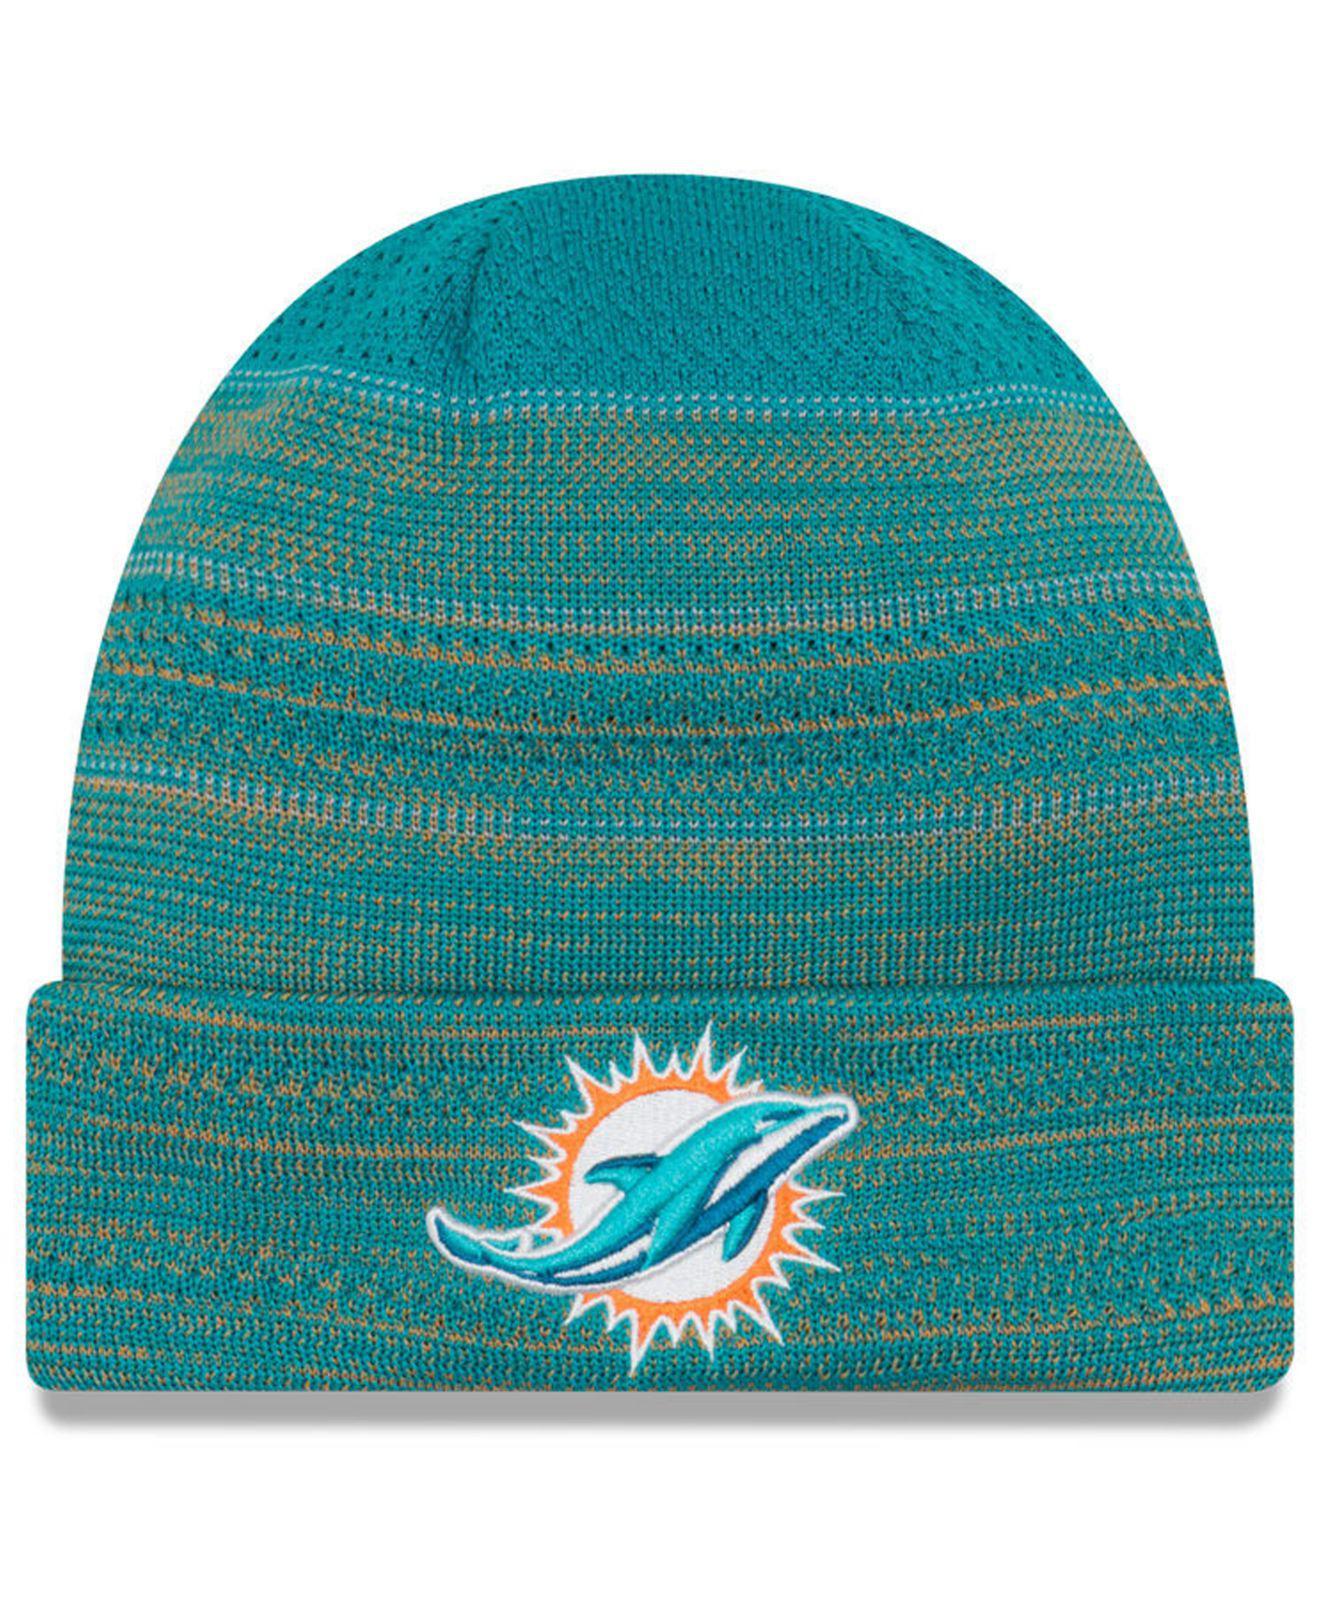 a04b5726 top quality miami dolphins beanie hats off b506a f2d1b